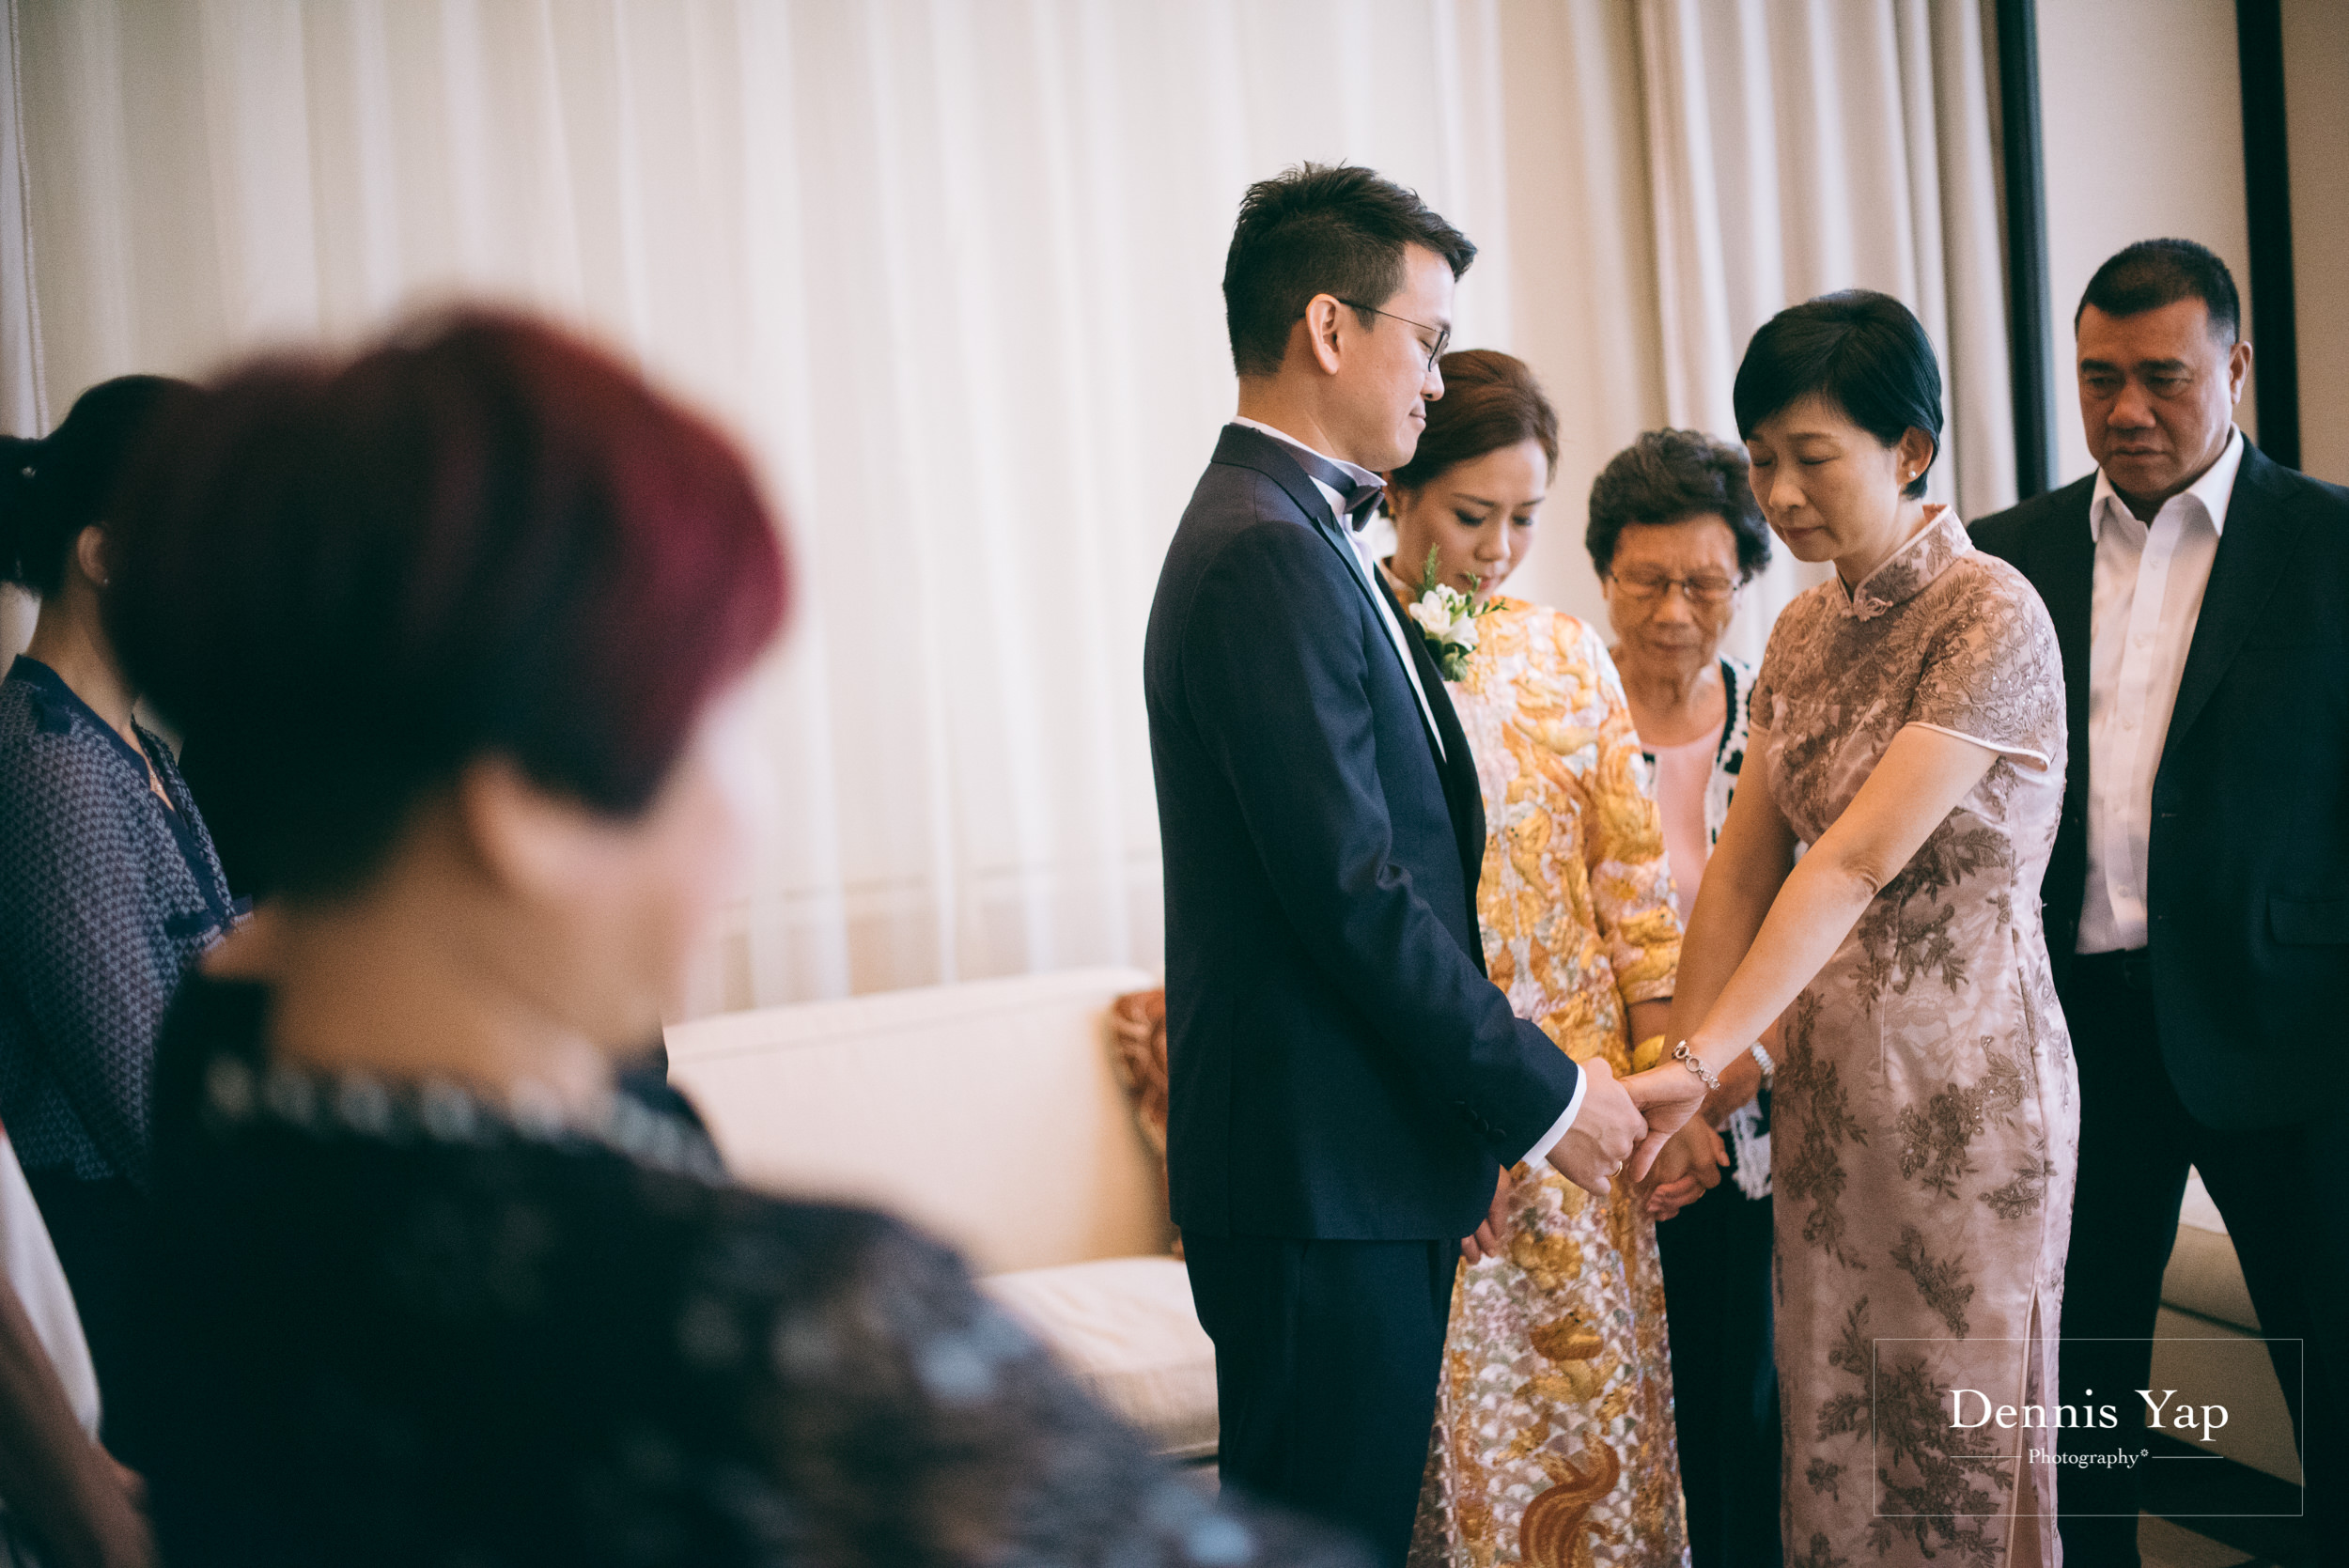 jason crystal wedding day gate crash hong kong garden wedding dennis yap photography-14.jpg